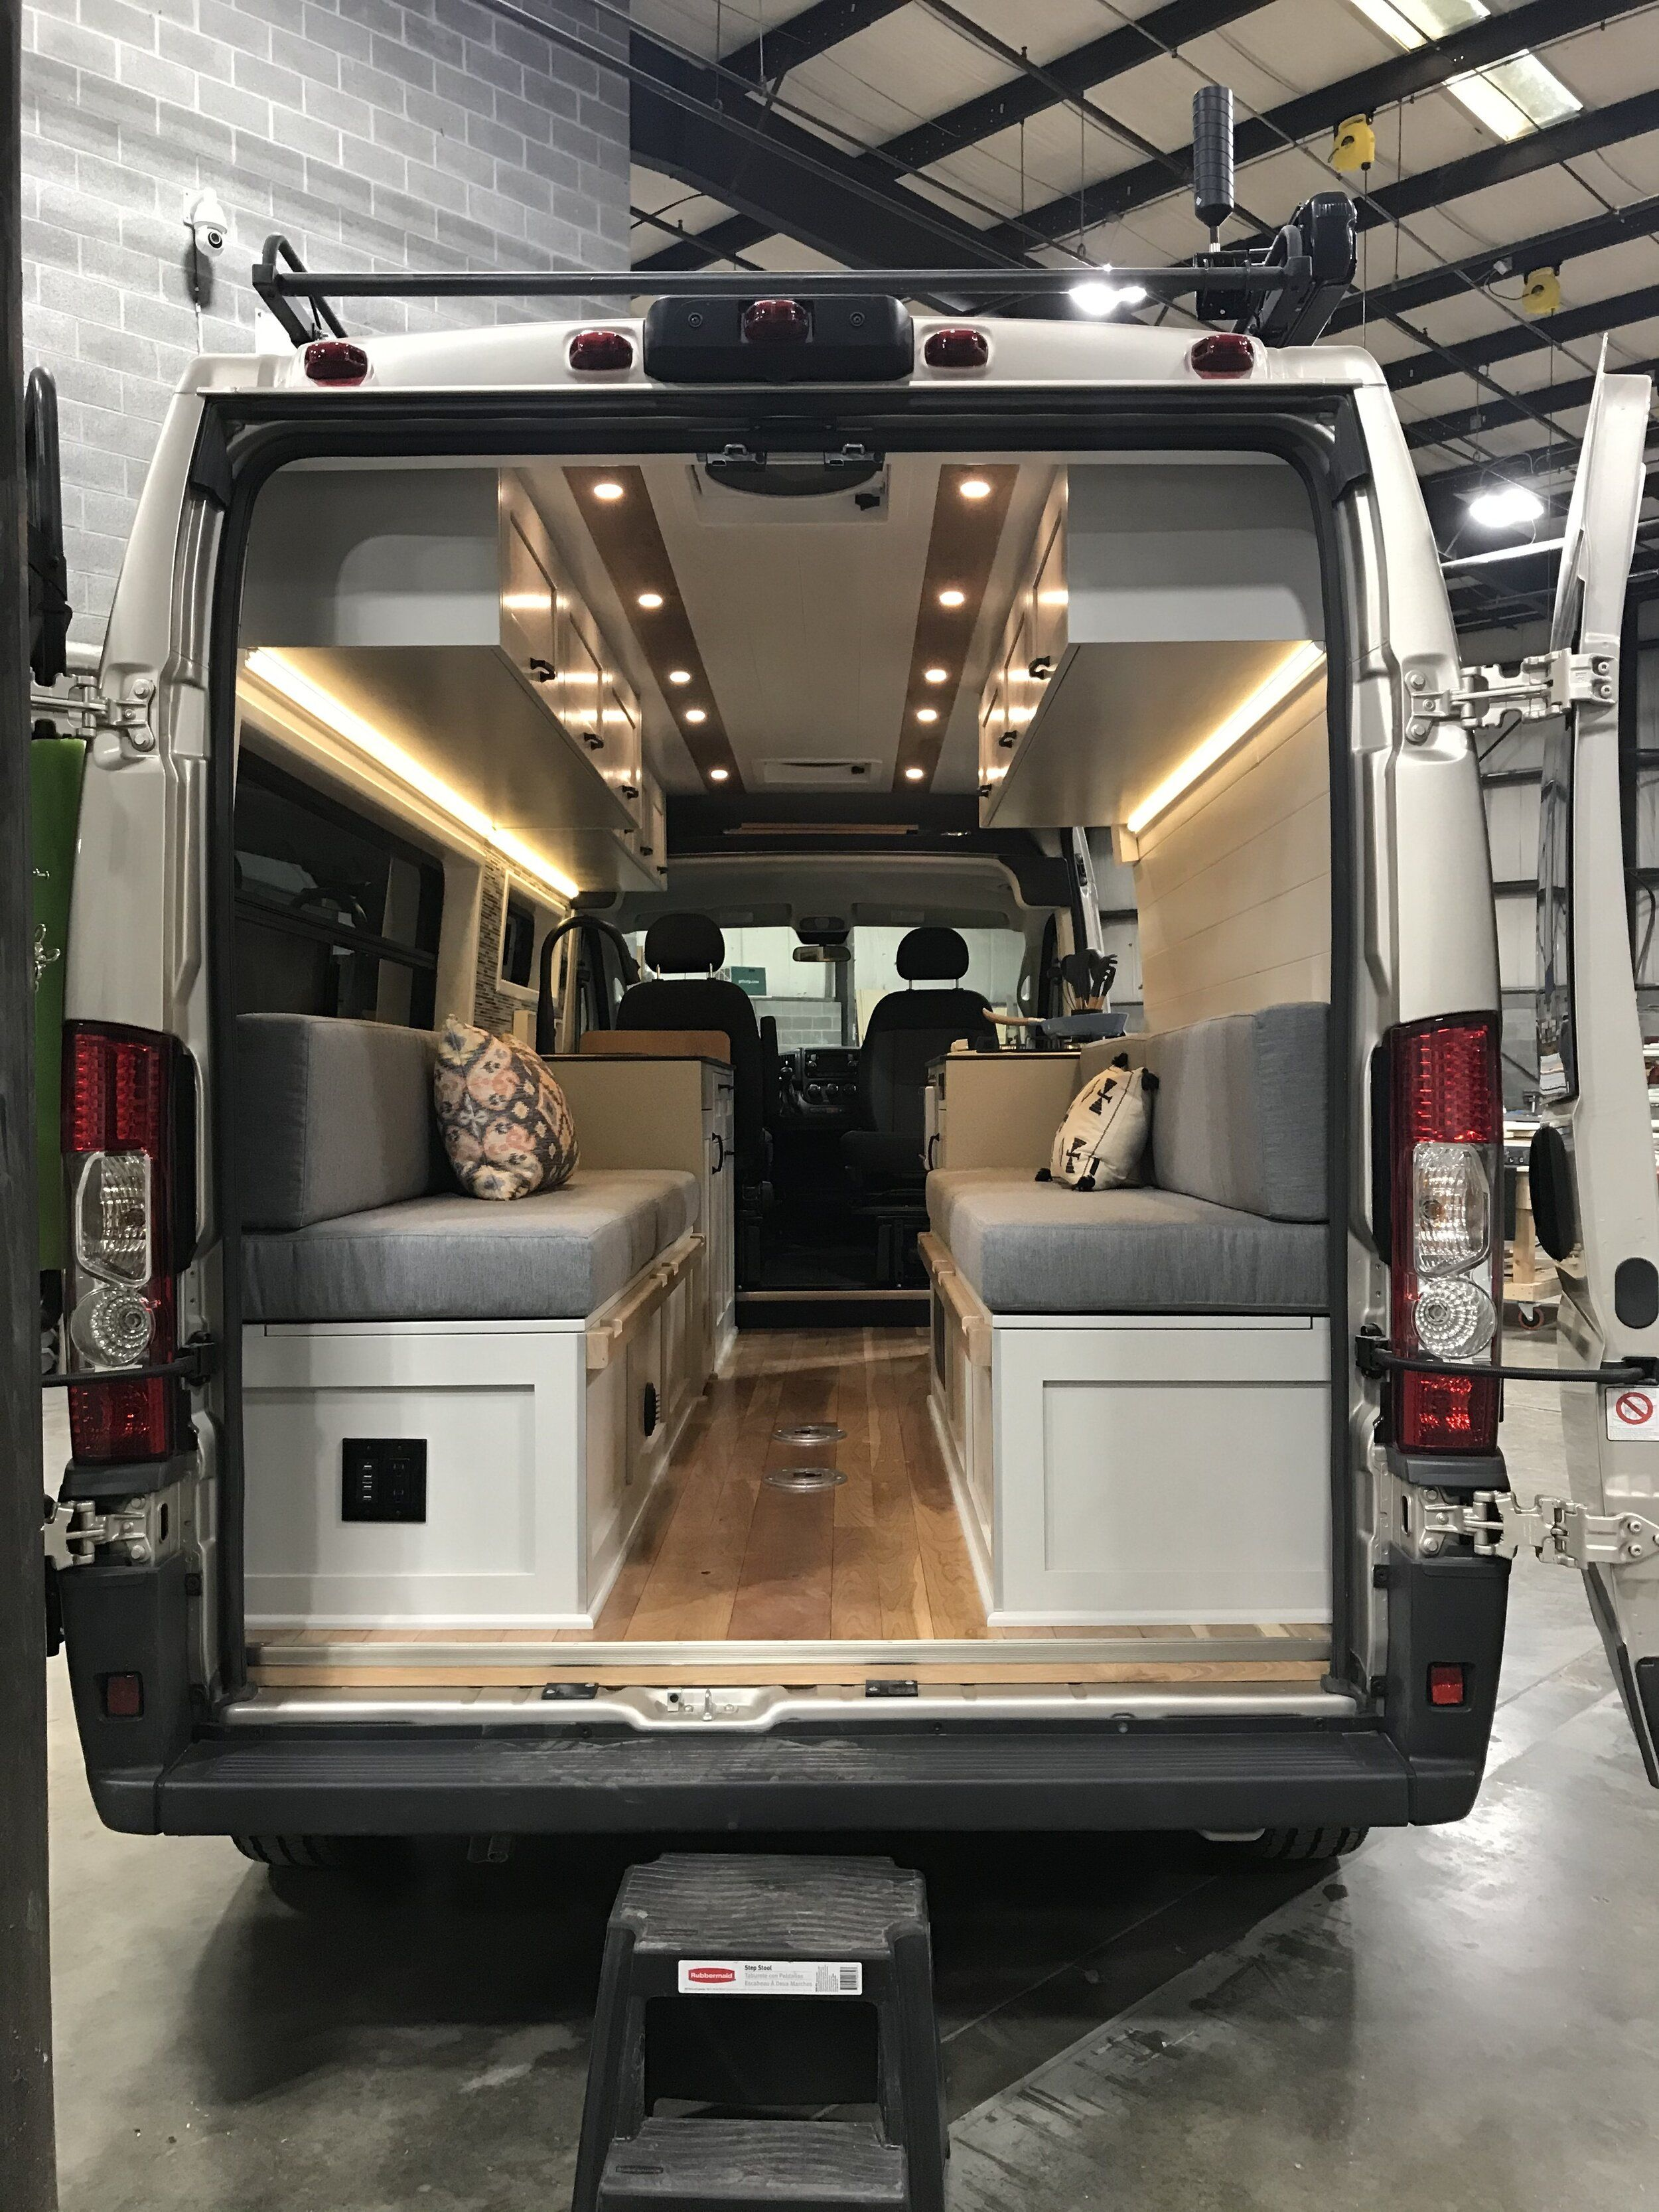 45+ Stealth camper van for sale Free